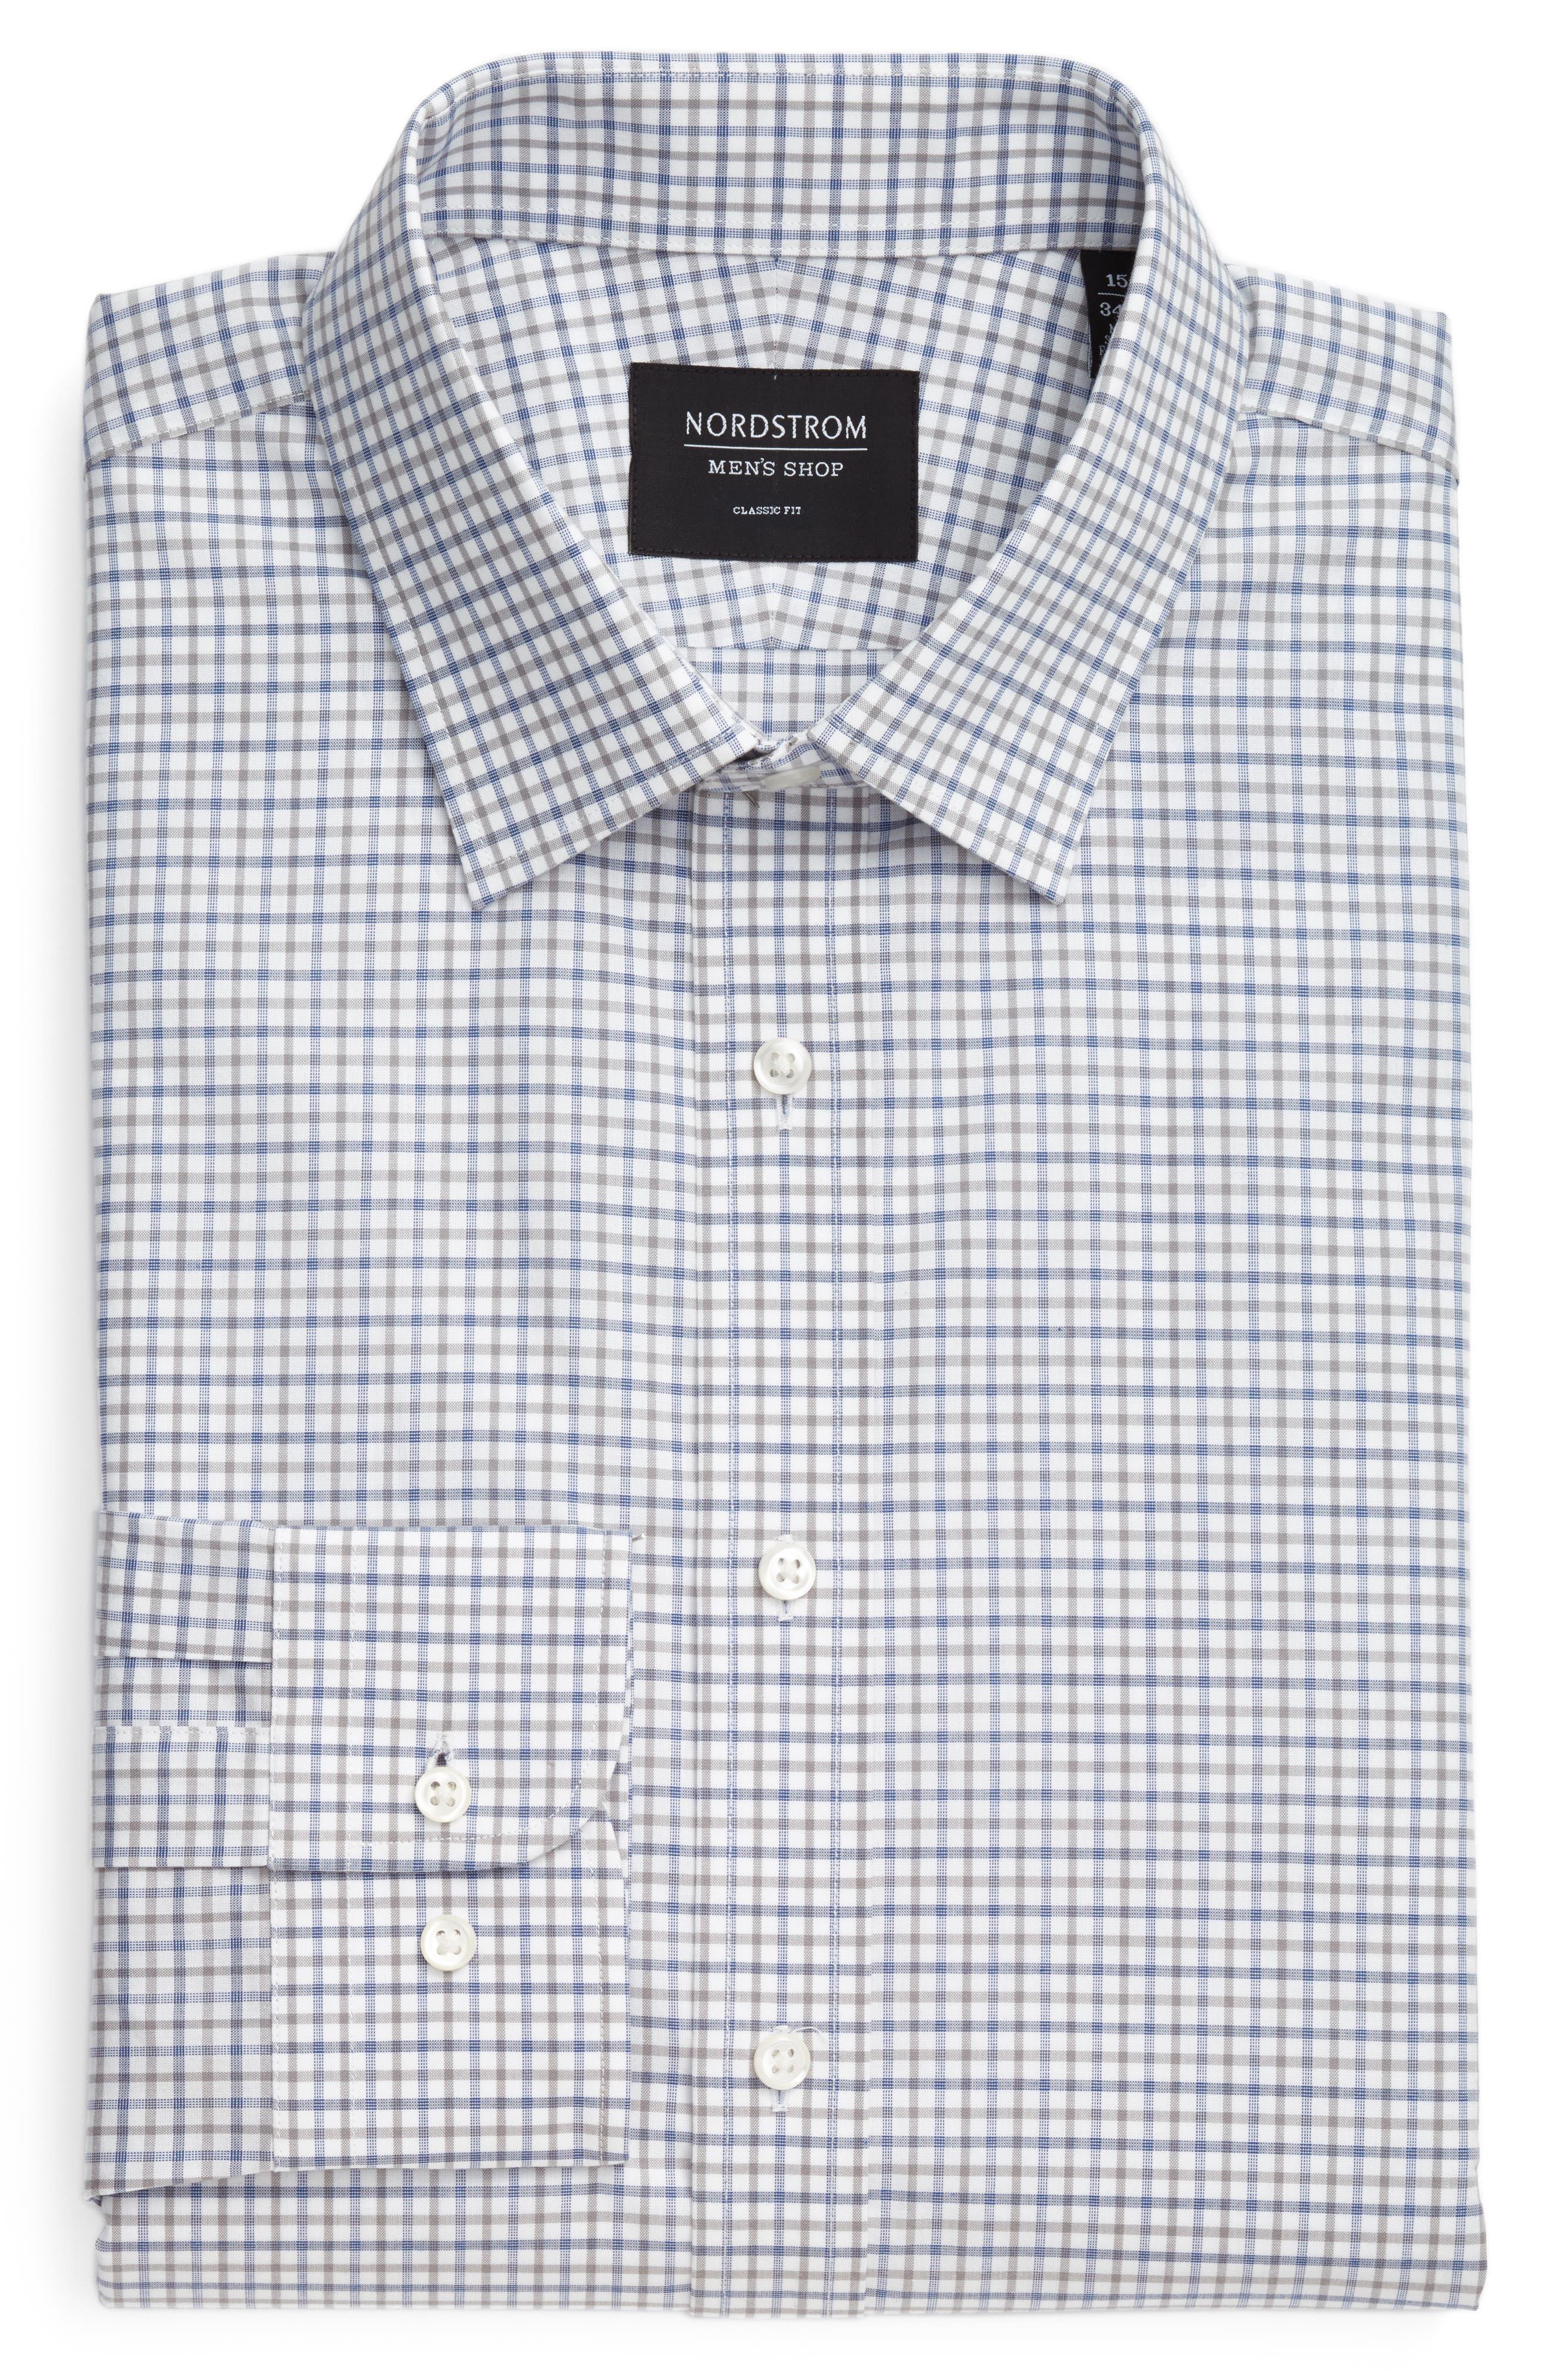 Classic Fit Check Dress Shirt,                             Alternate thumbnail 5, color,                             050